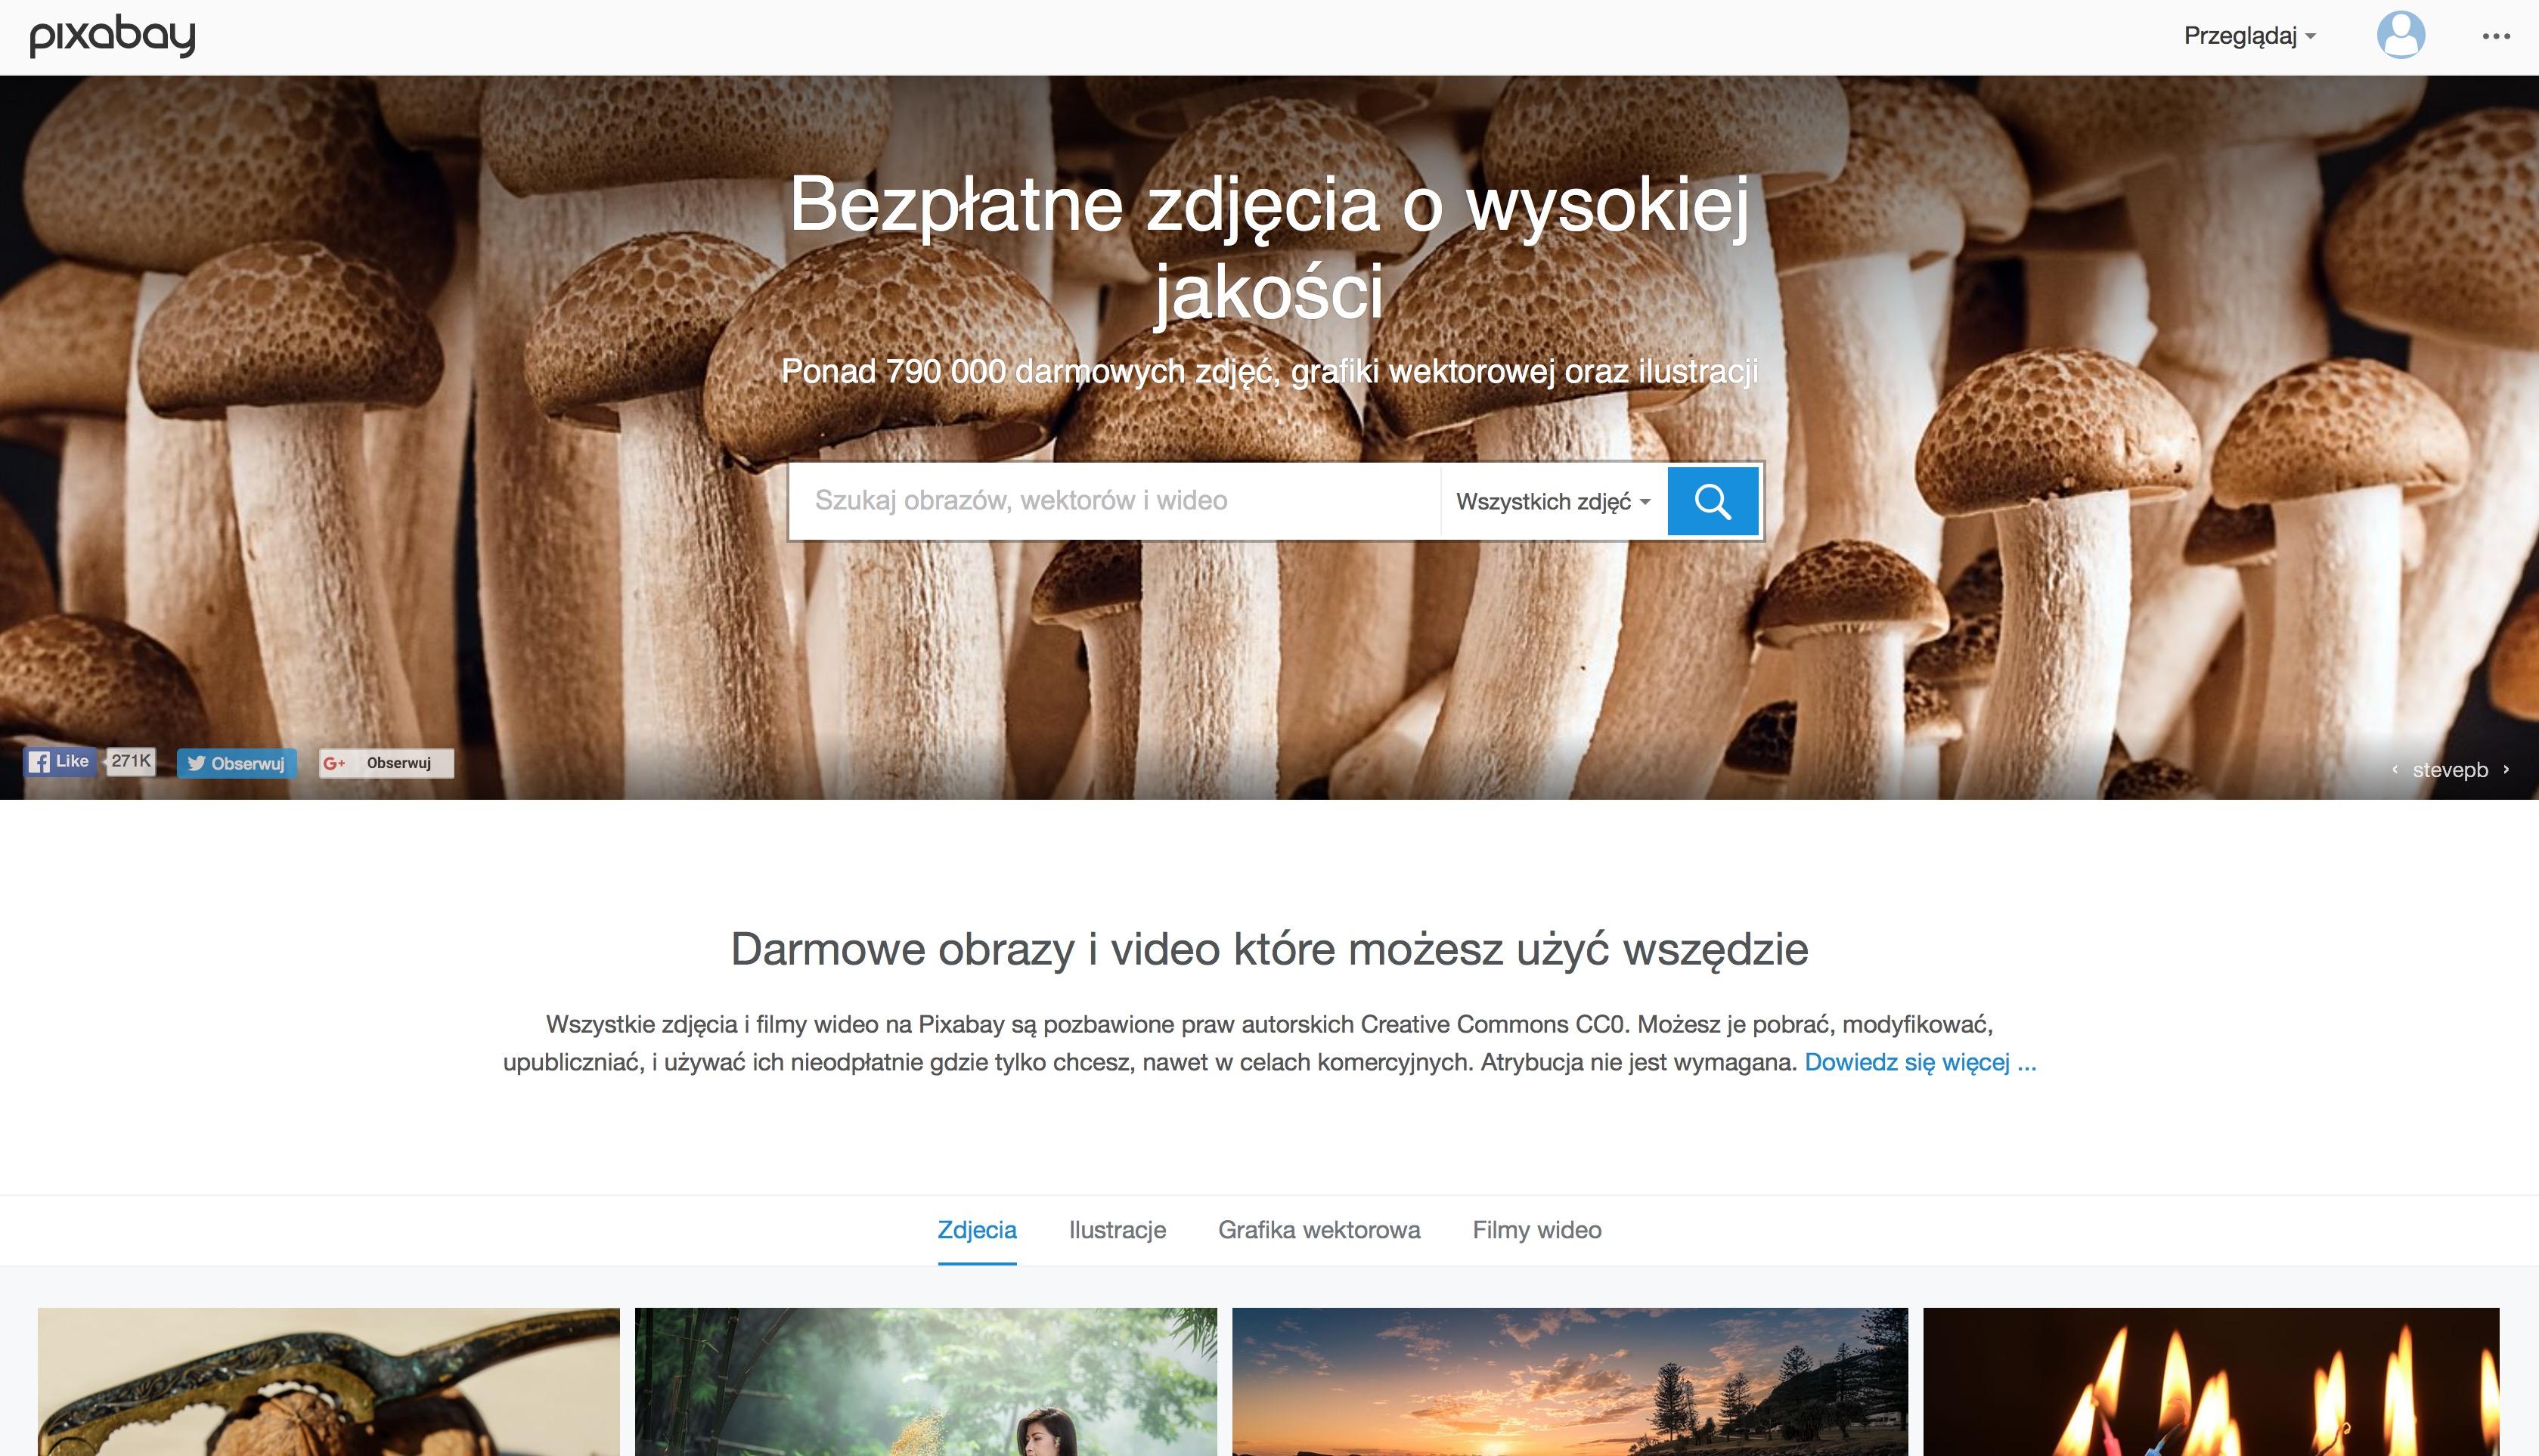 mediarun-pixabay